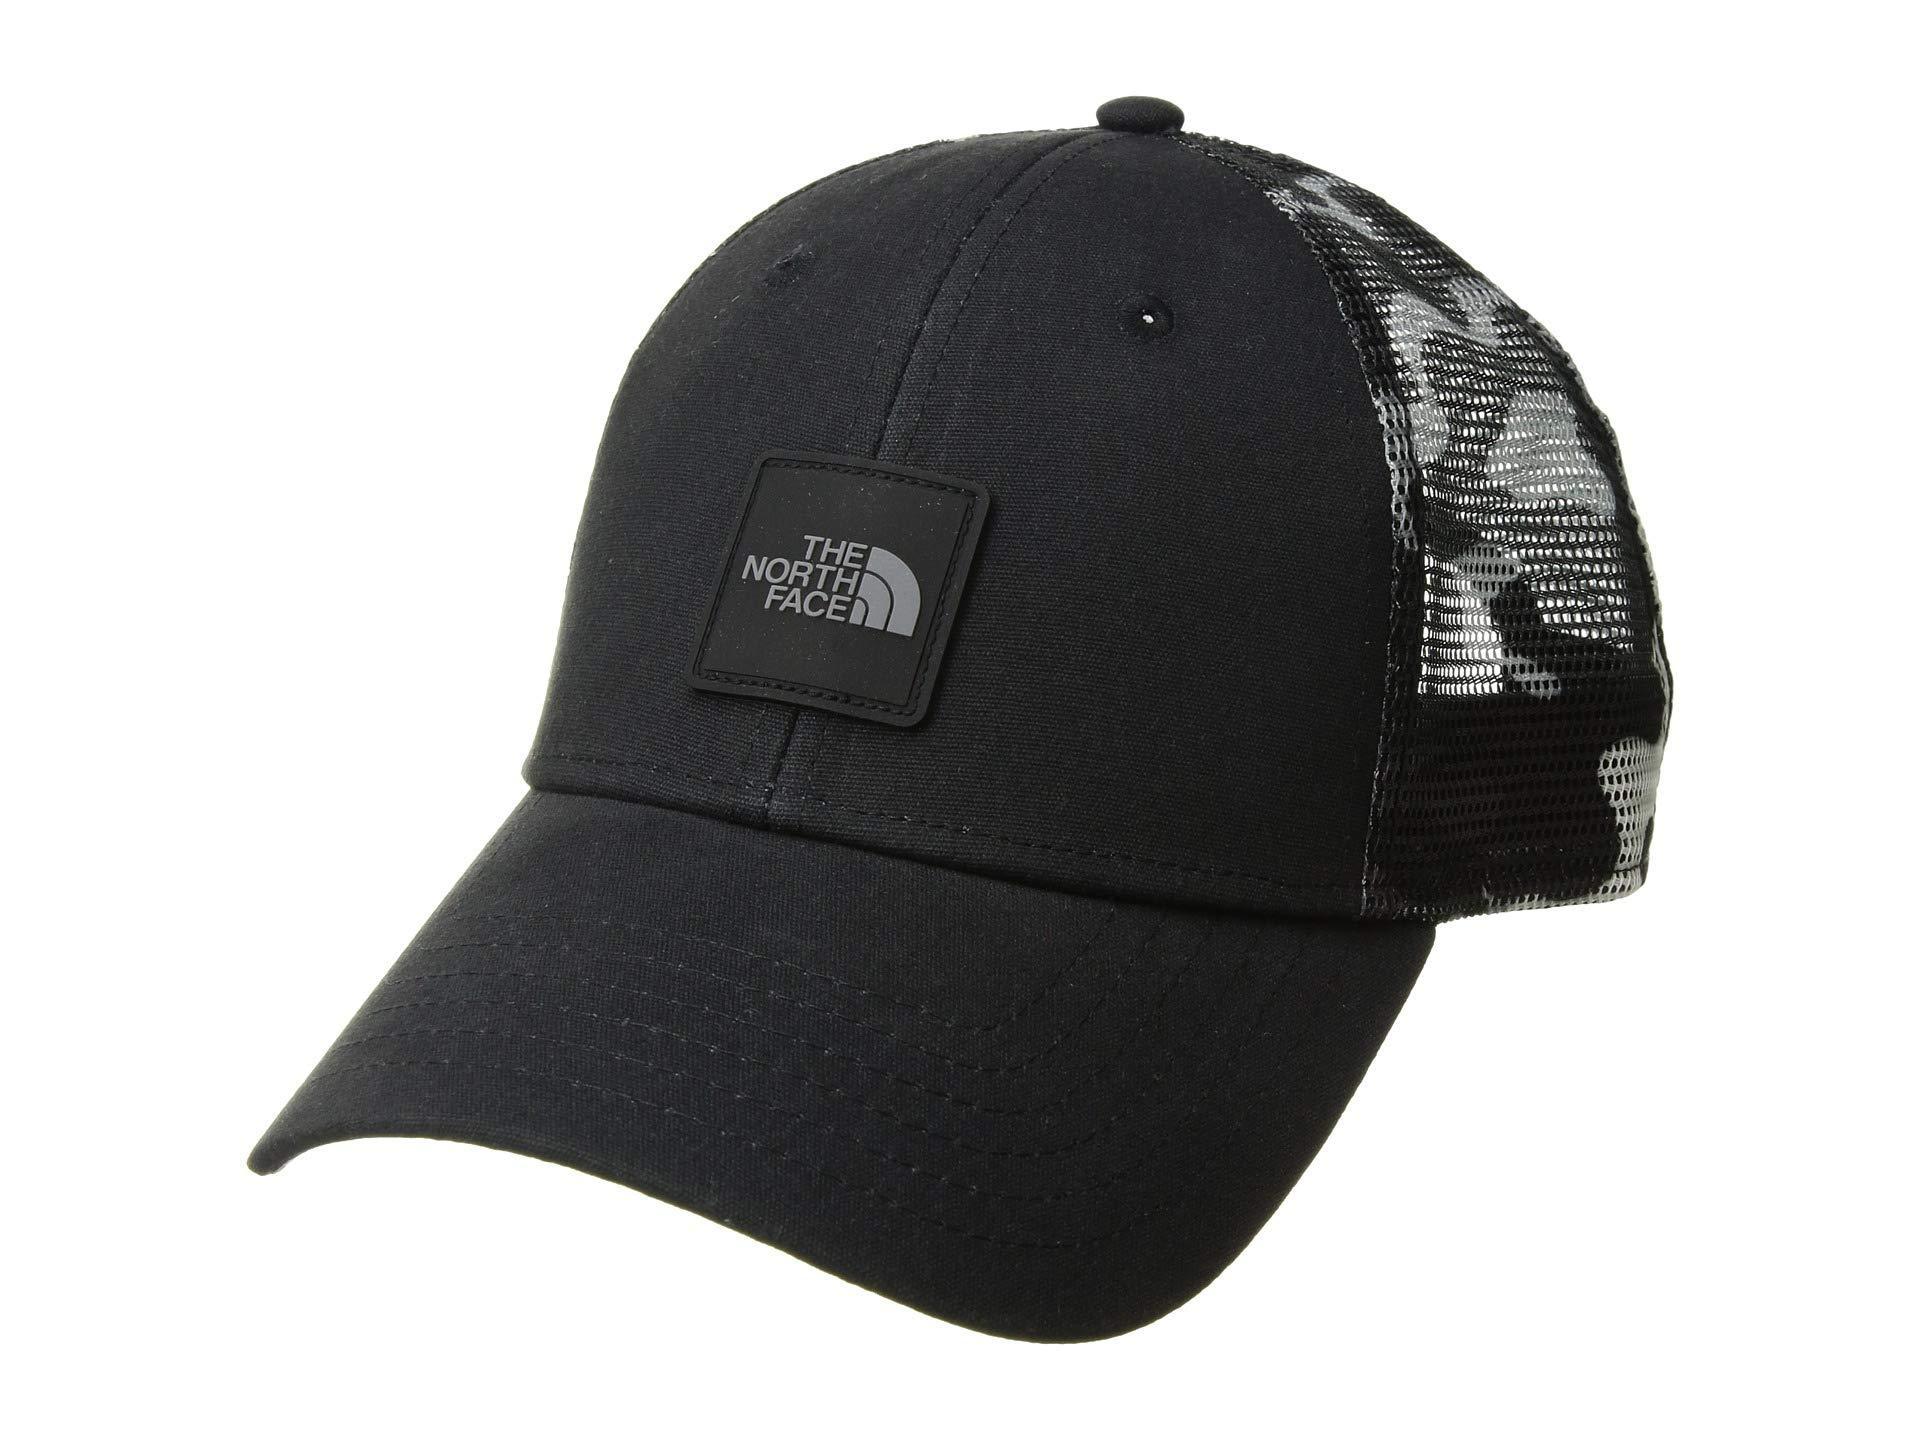 2c55b8dafcf03 The North Face Mudder Novelty Mesh Trucker Hat (tnf Black ...